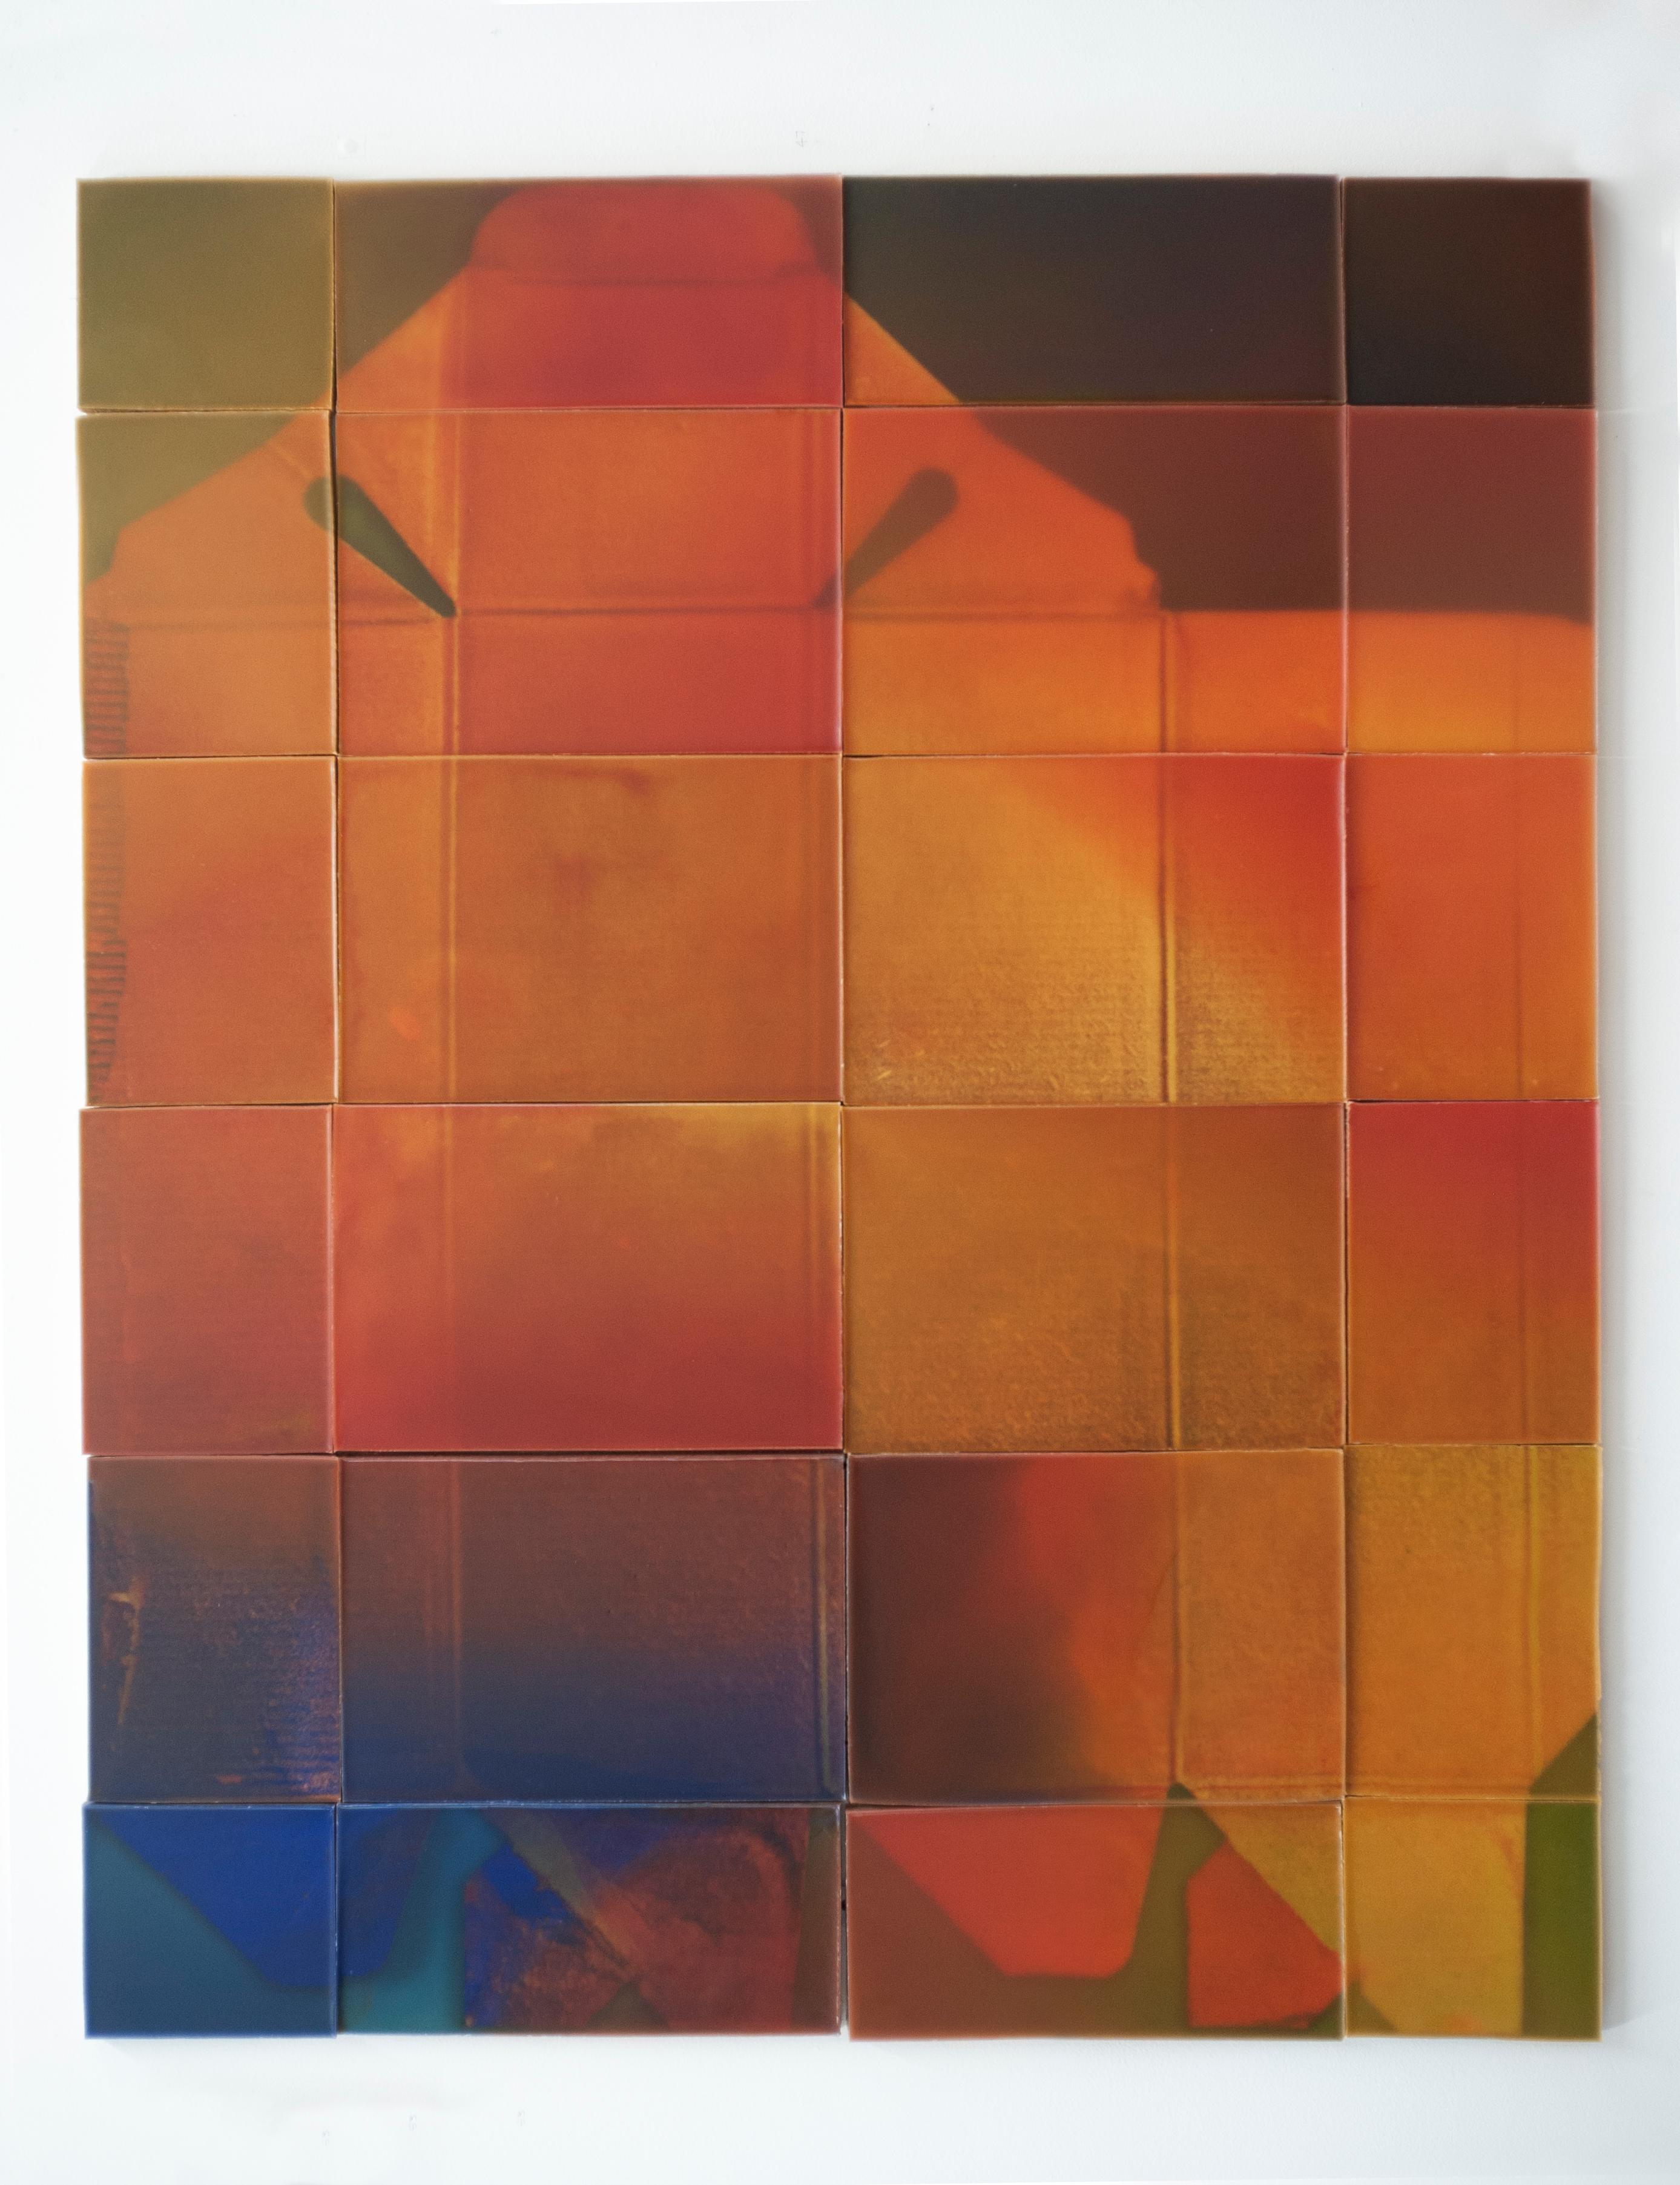 """Johnnie Walker Black"", waxwork multi-panel wall installation"